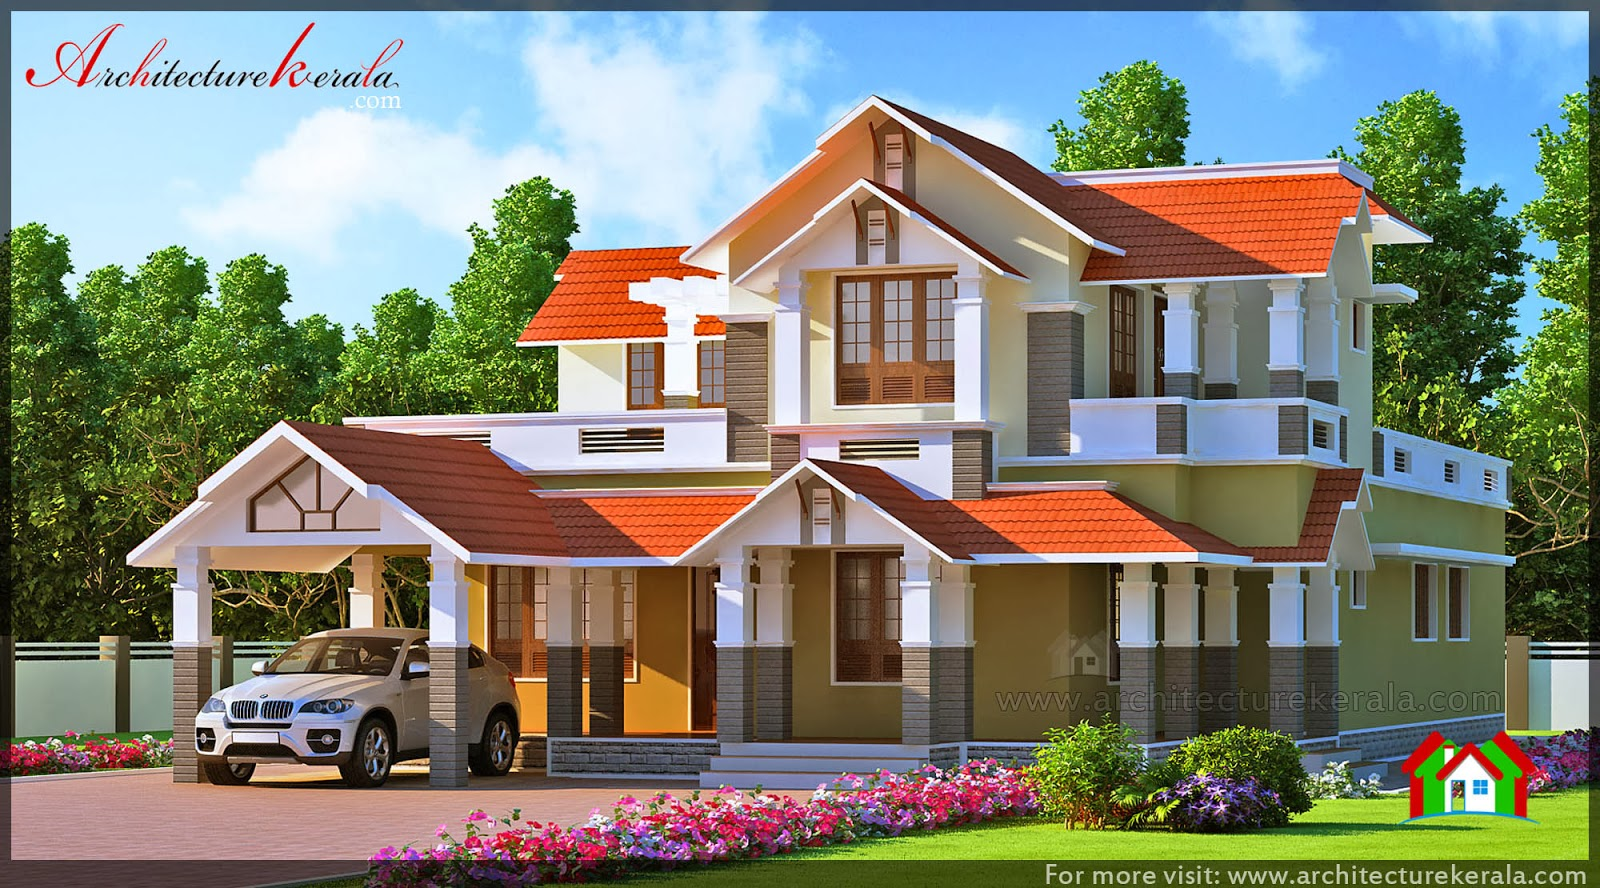 2900 SQUARE FEET KERALA HOUSE